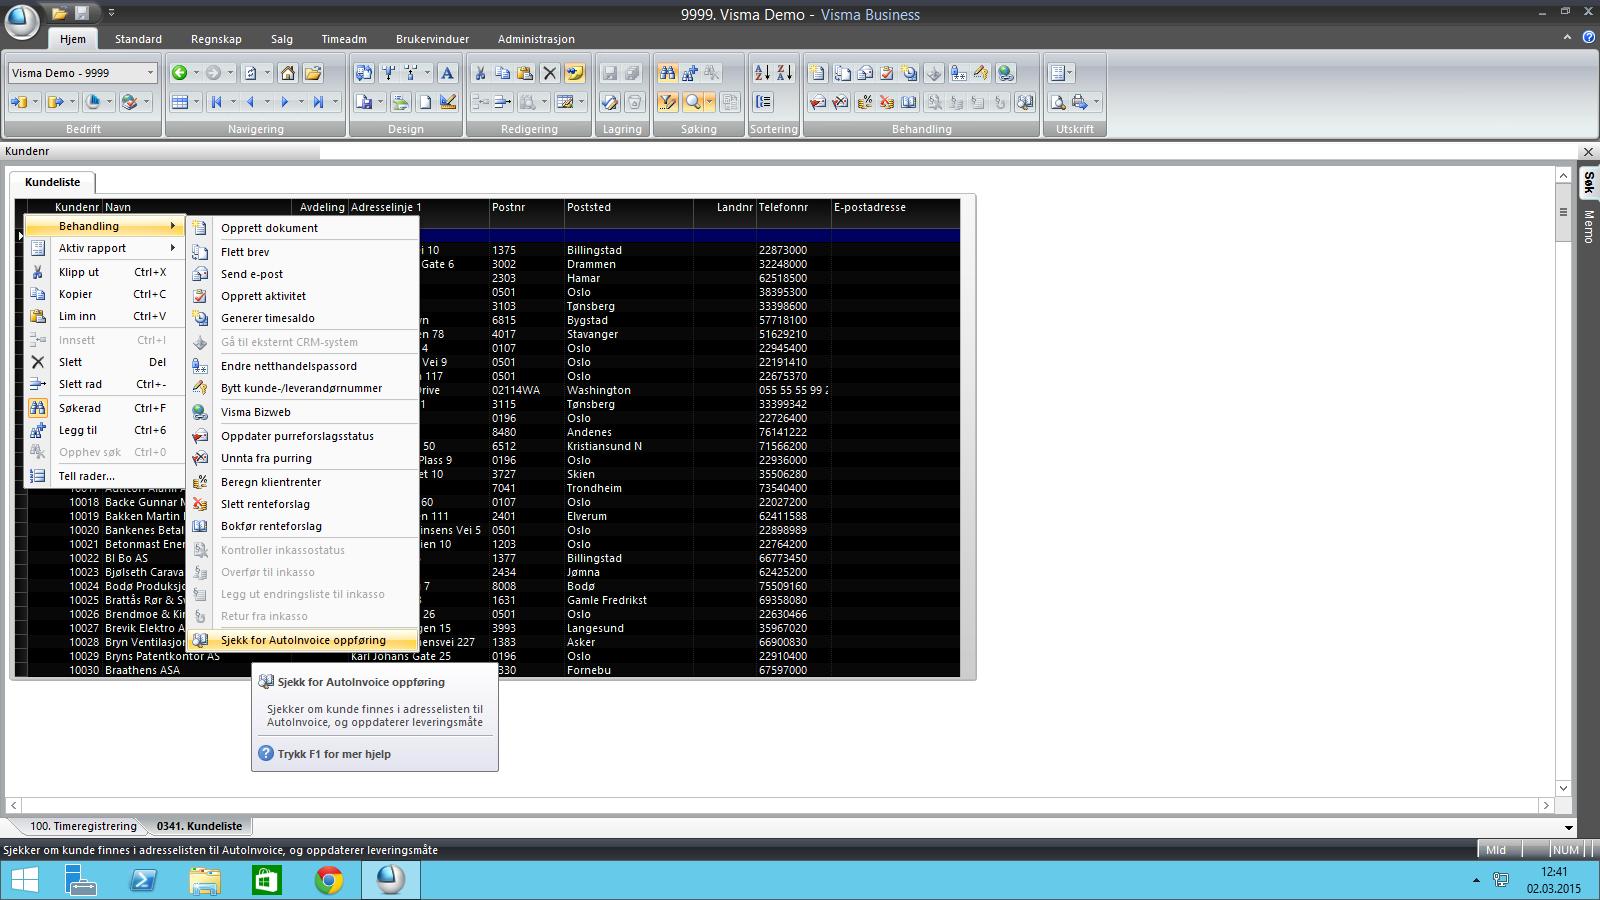 bb13949f VISMA BUSINESS: sjekk om dine kunder kan motta EHF faktura - Abacus IT